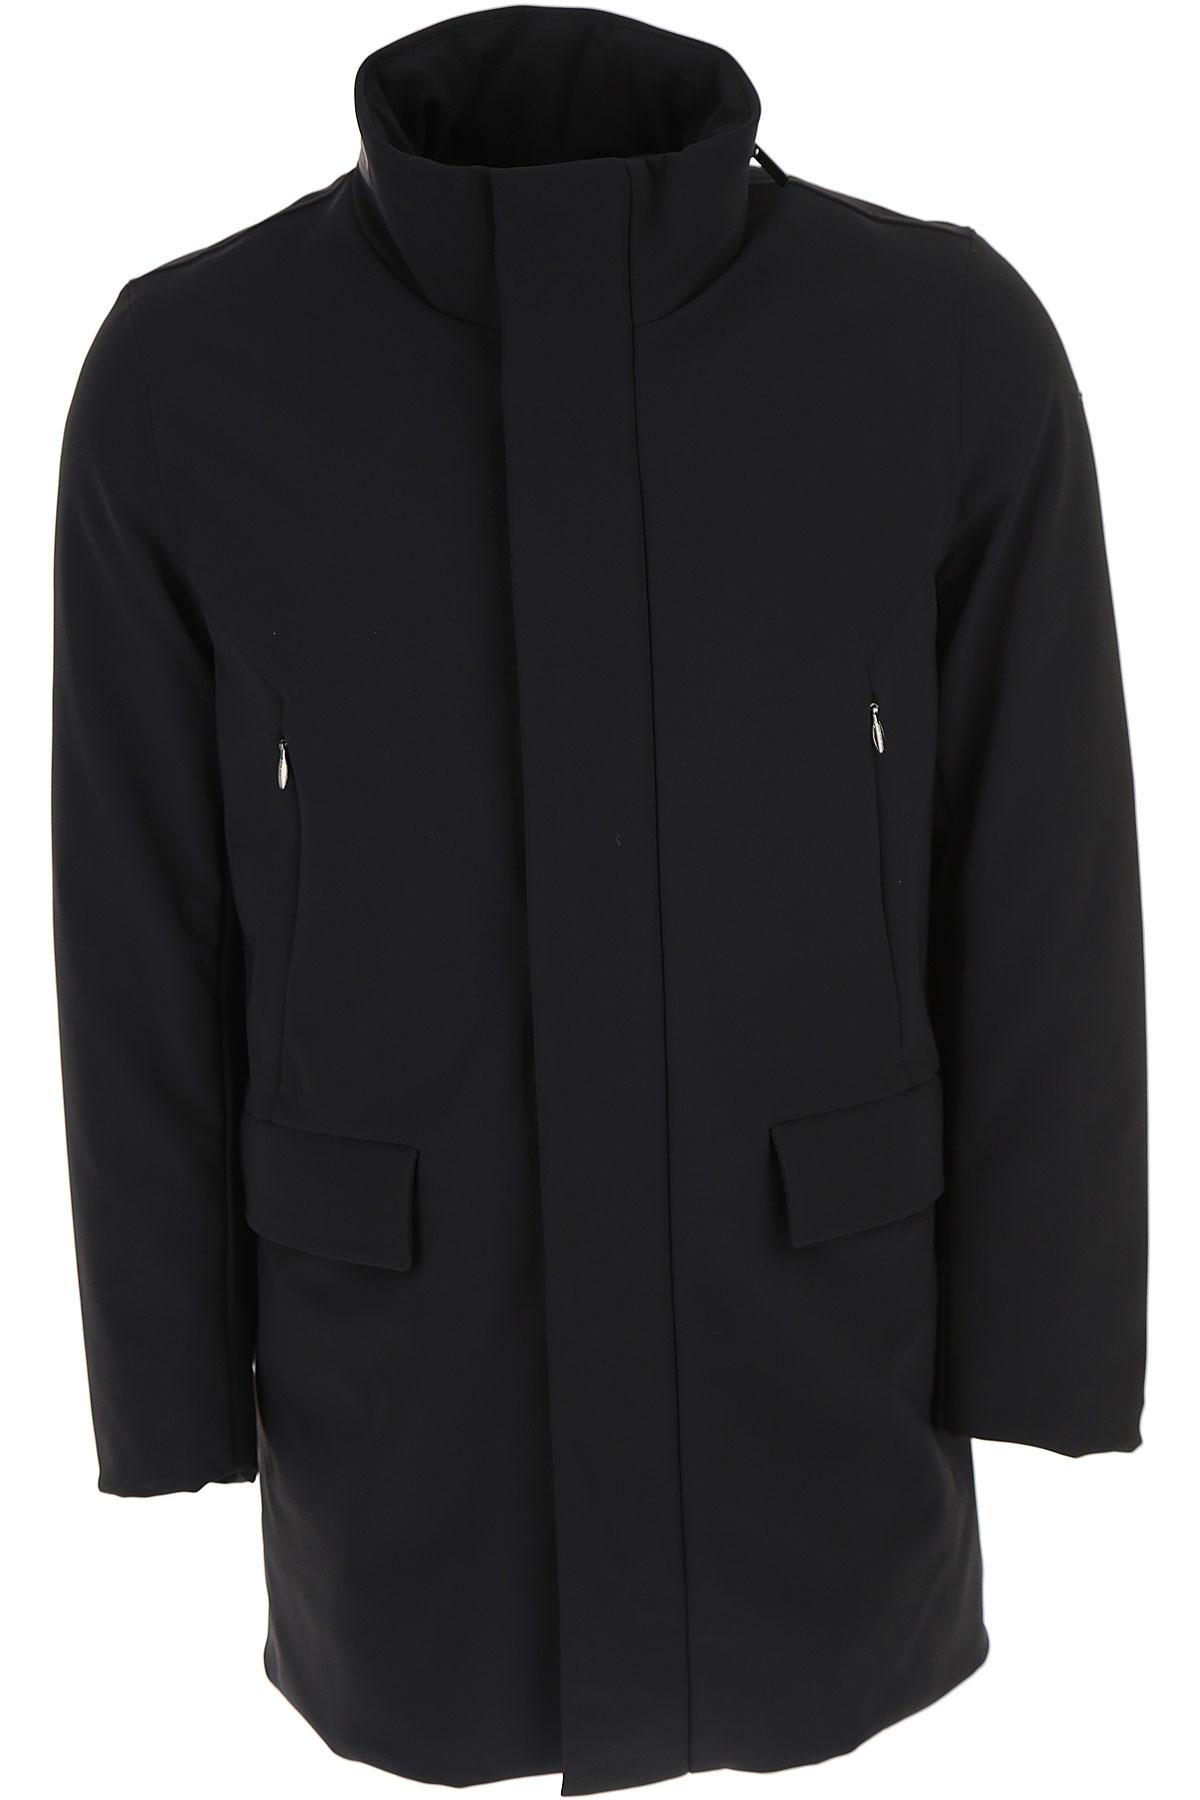 Image of RRD Down Jacket for Men, Puffer Ski Jacket, Black, polyester, 2017, L M XL XXL